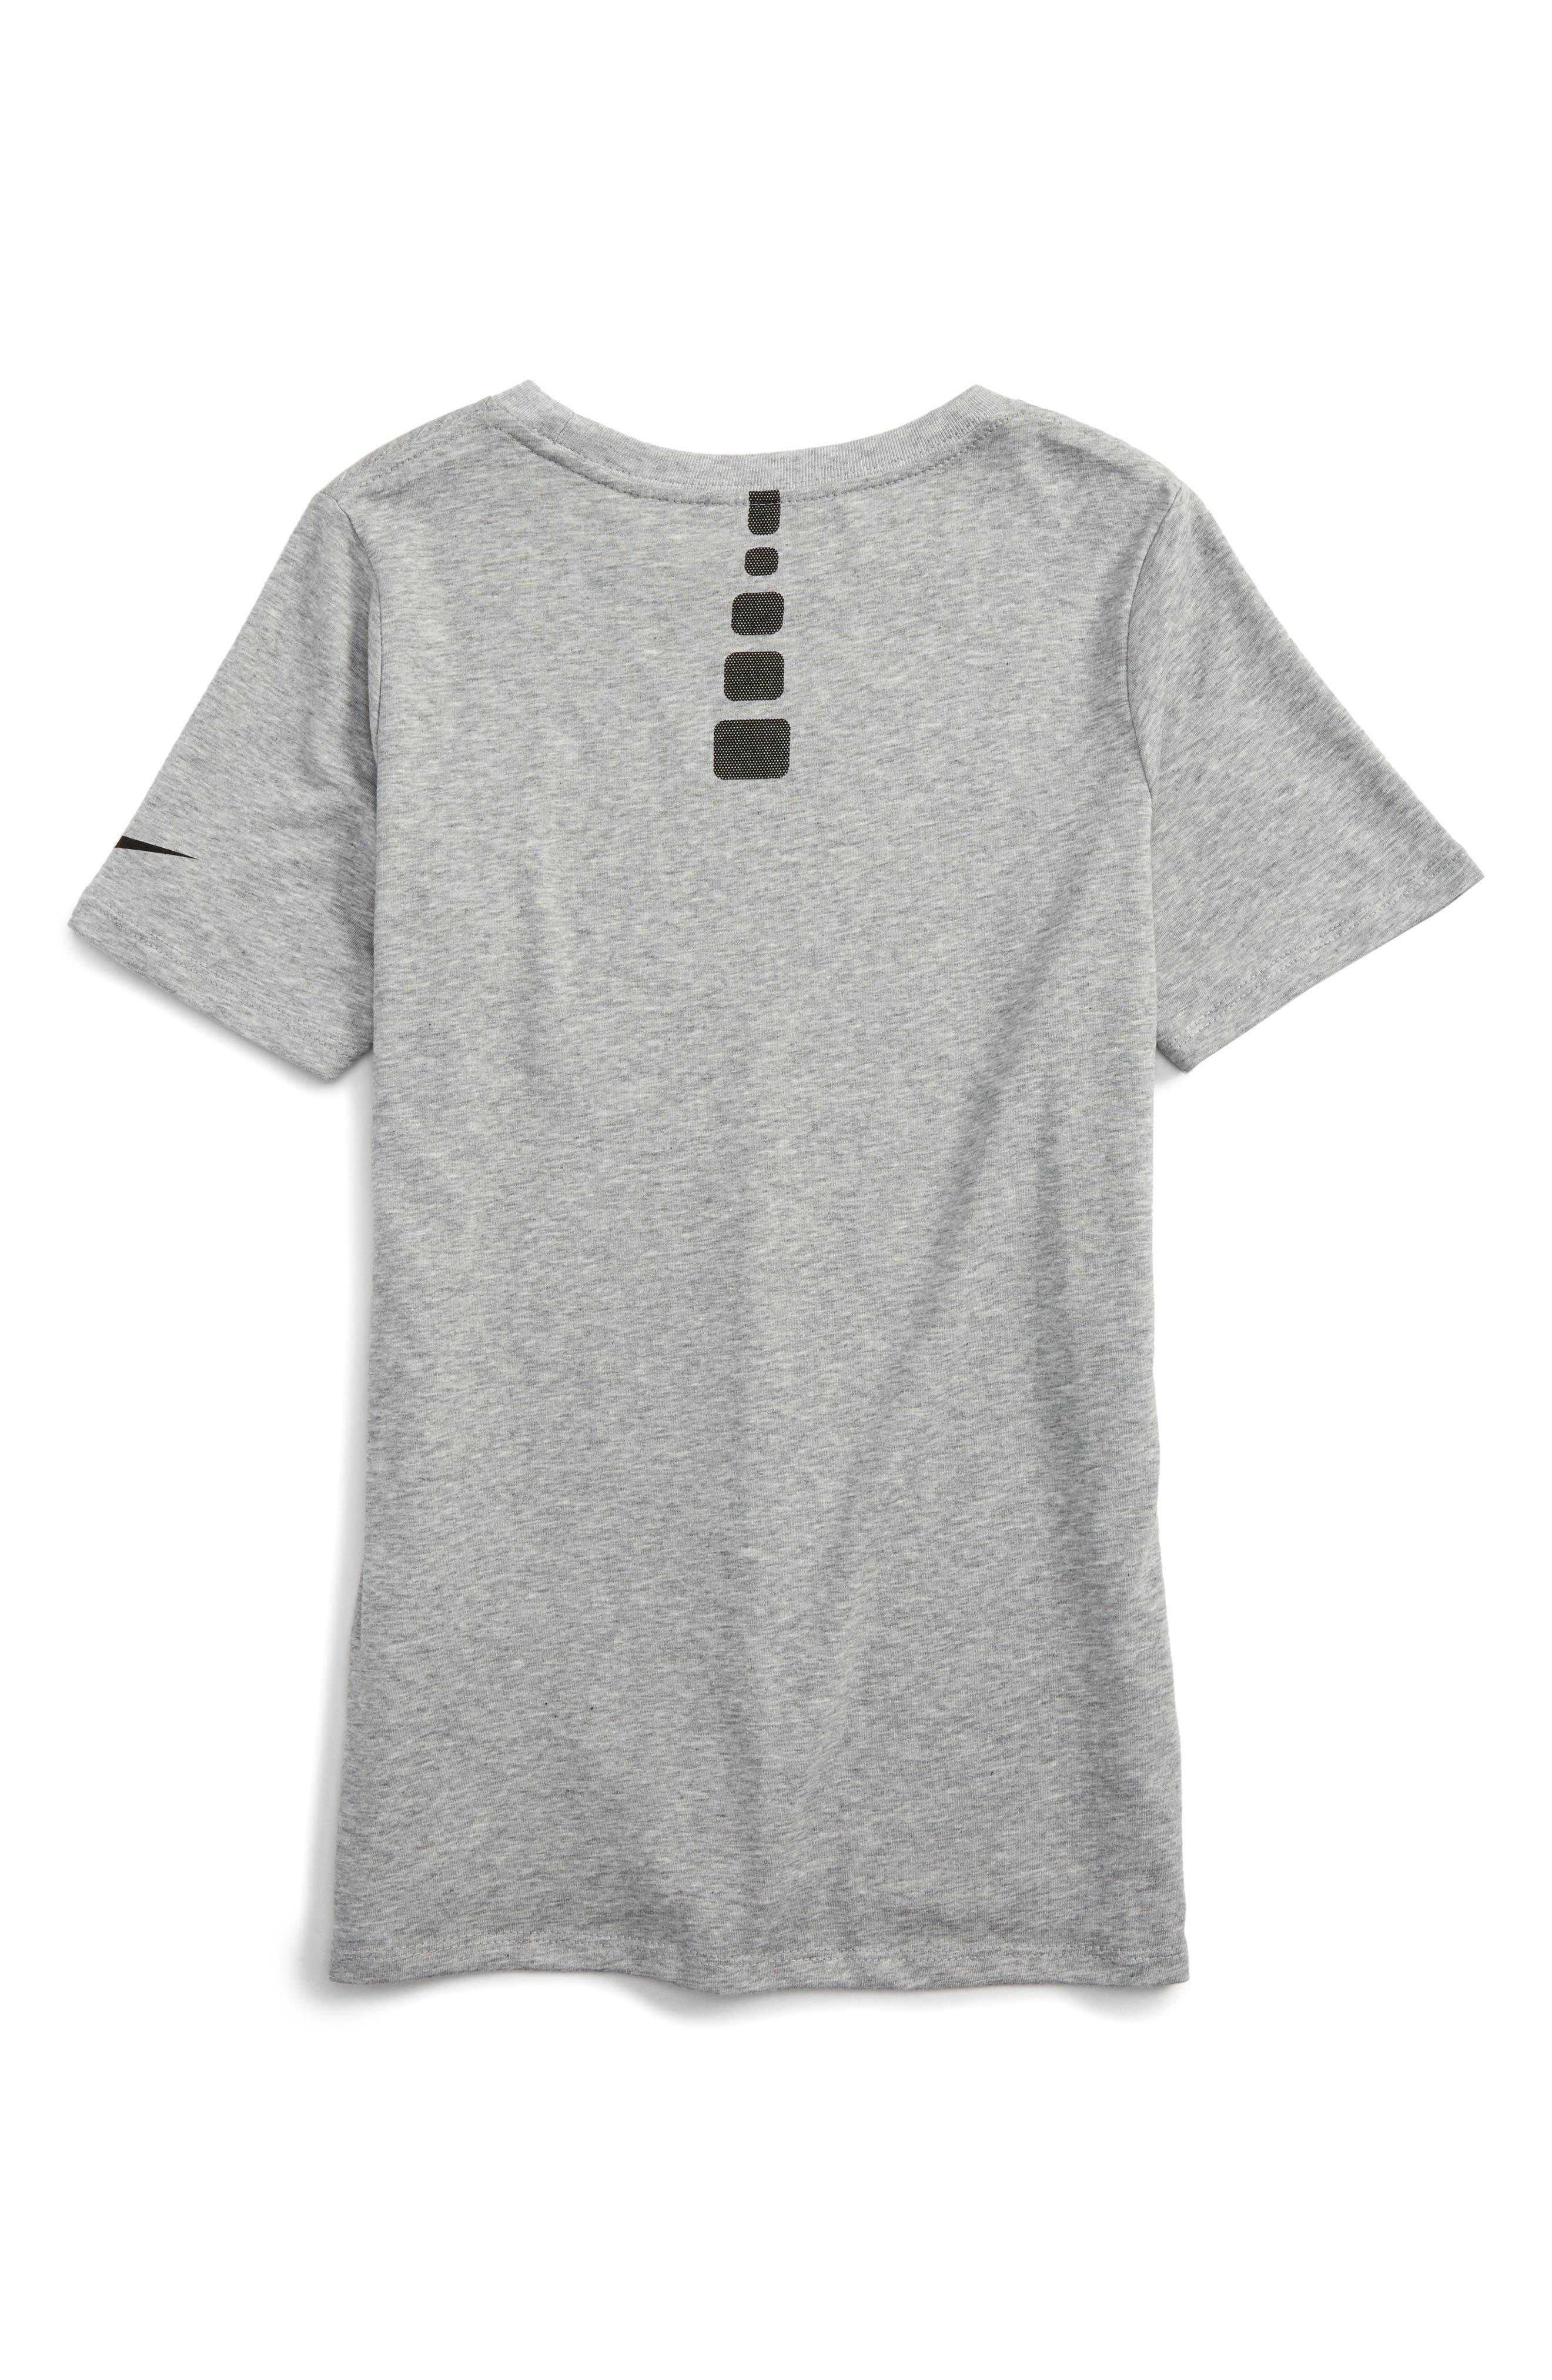 Dry Elite Fade Away Graphic T-Shirt,                             Alternate thumbnail 2, color,                             D Gr H